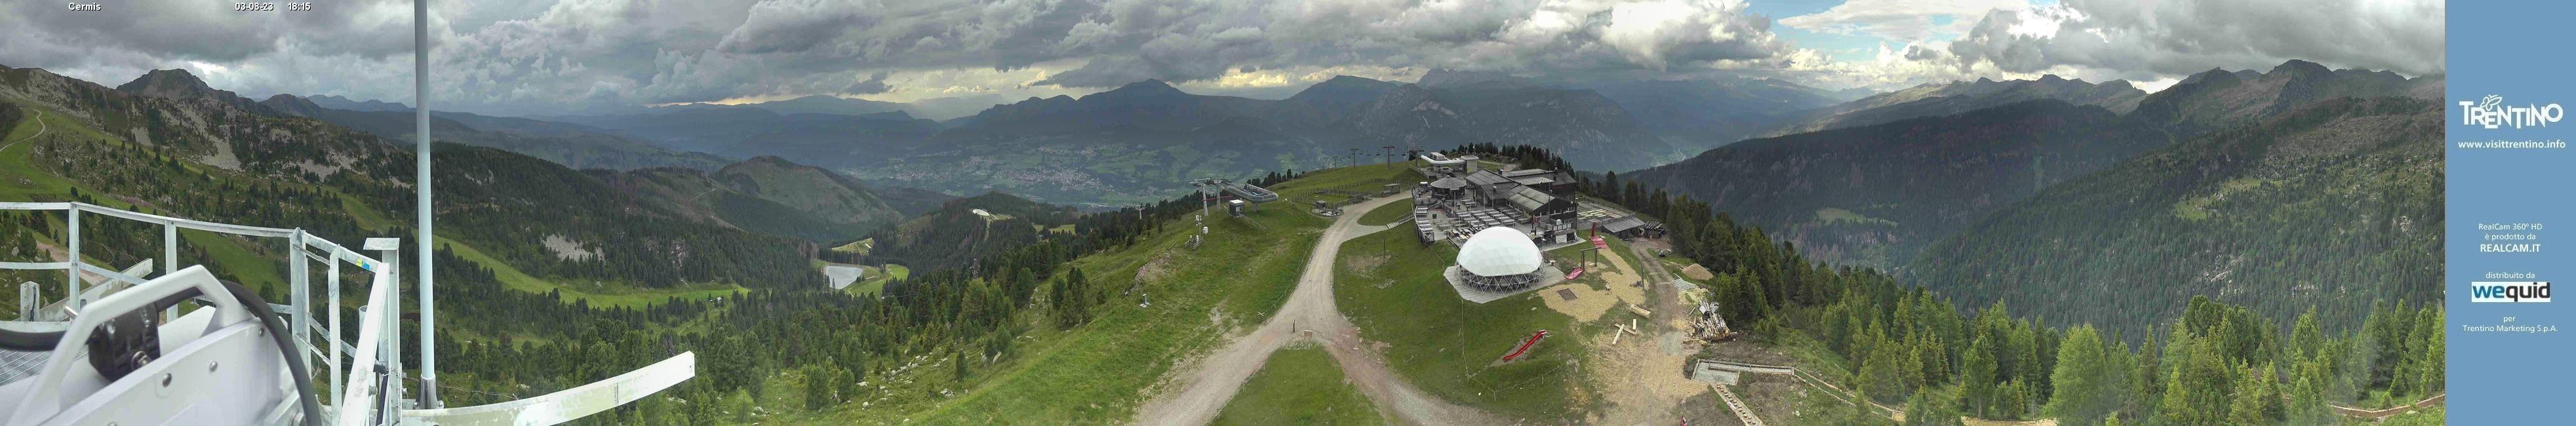 Alpe Cermis Cavalese webcam panorama